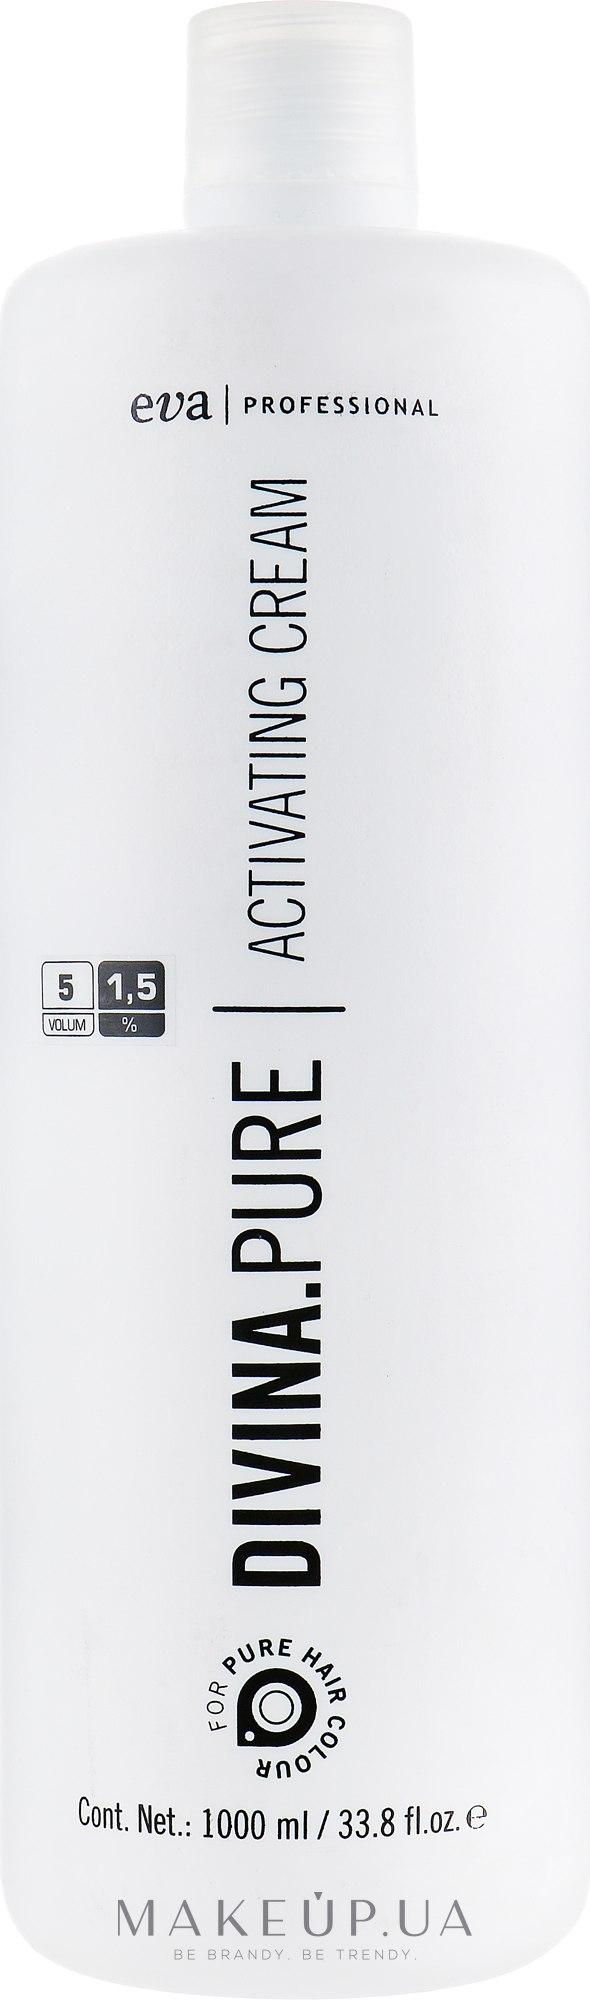 Крем-оксидант - Eva Professional Divina Pure Activating Cream 5vº/1,5% — фото 1000ml